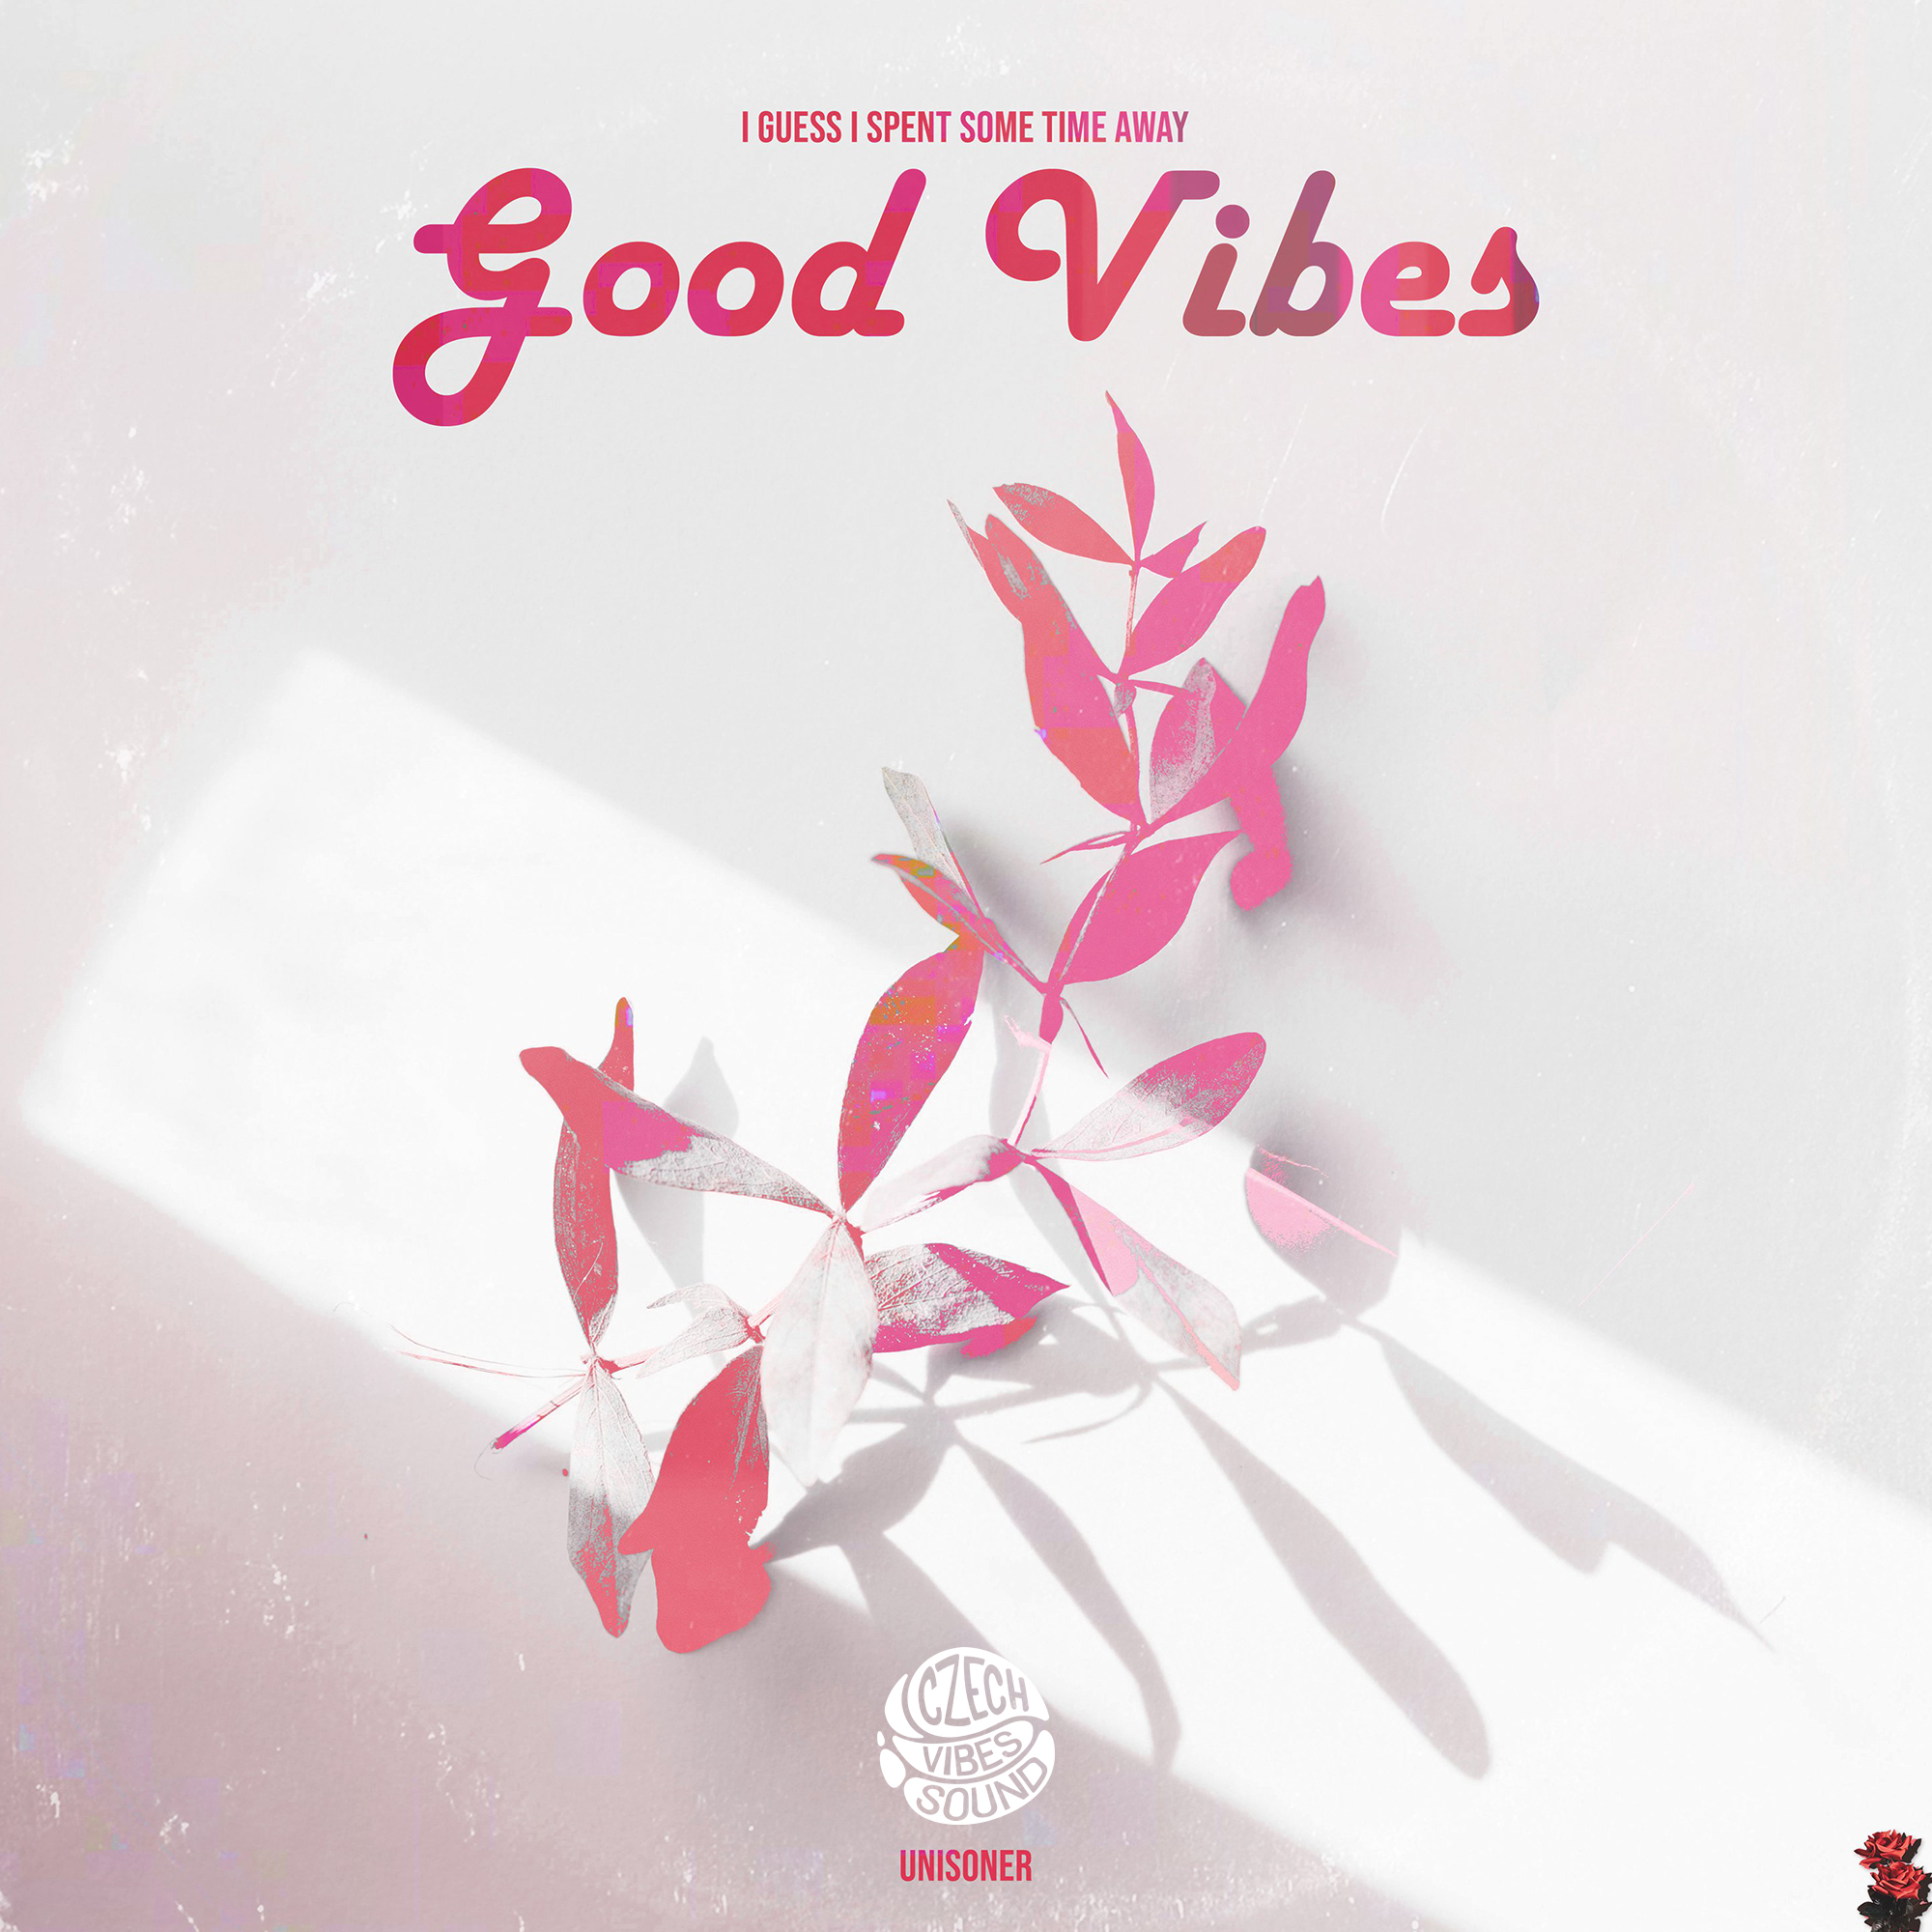 Unisoner - Good Vibes